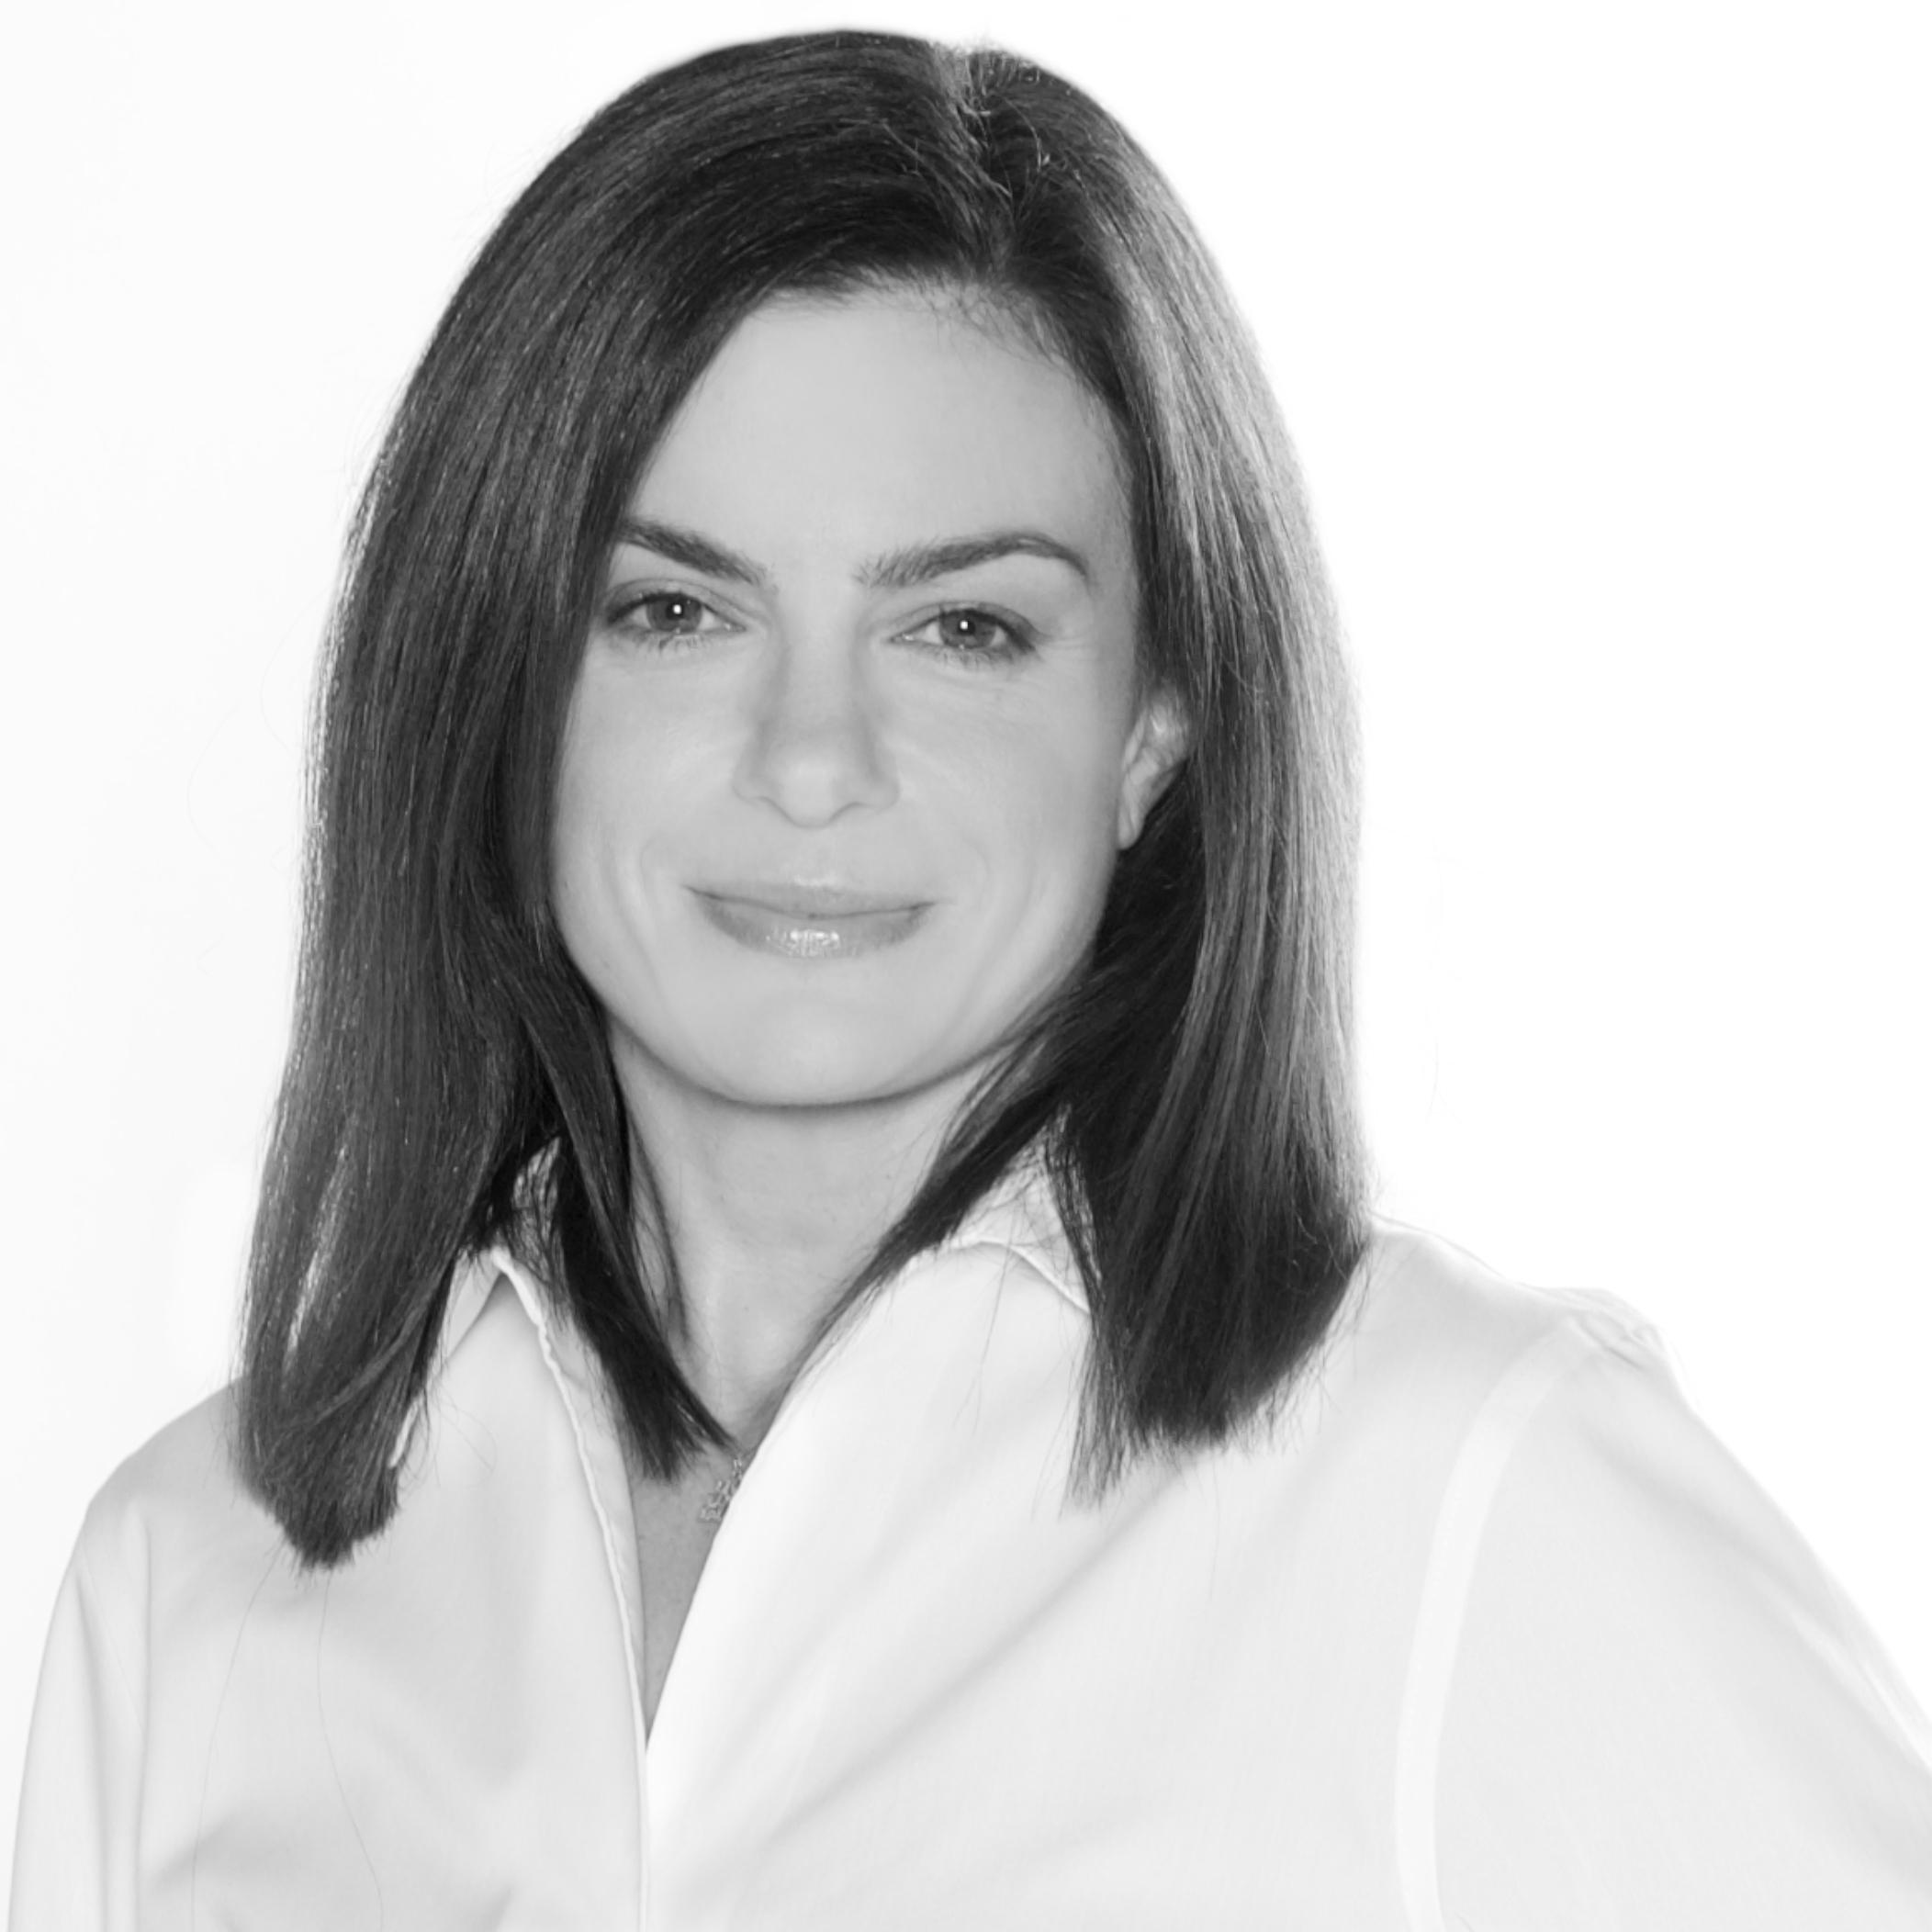 Diana Galian